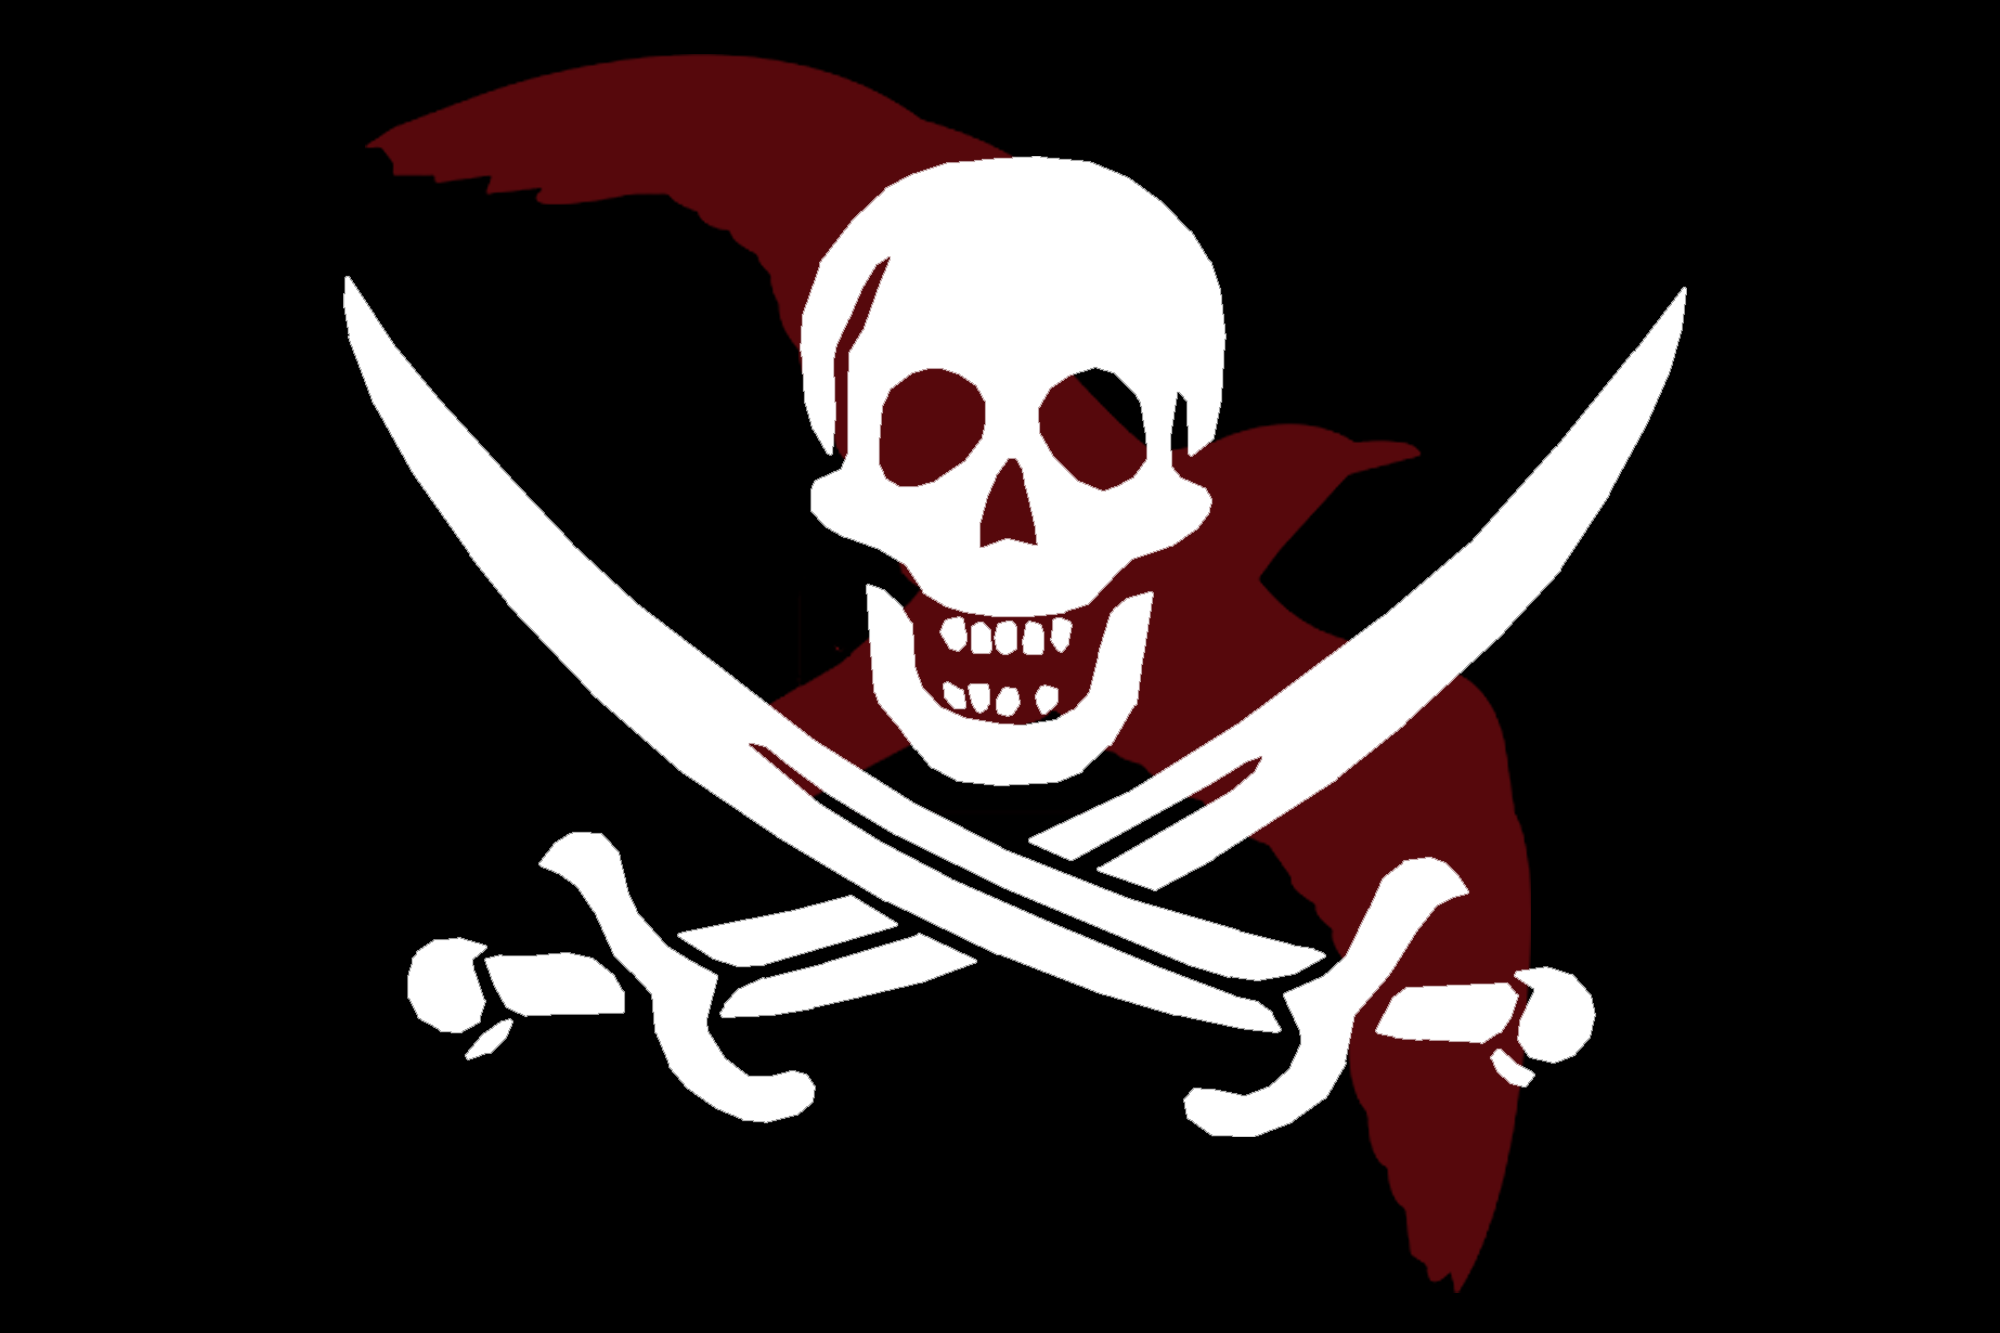 Barbossa_second_flag---Kopiebryb4jm8.png